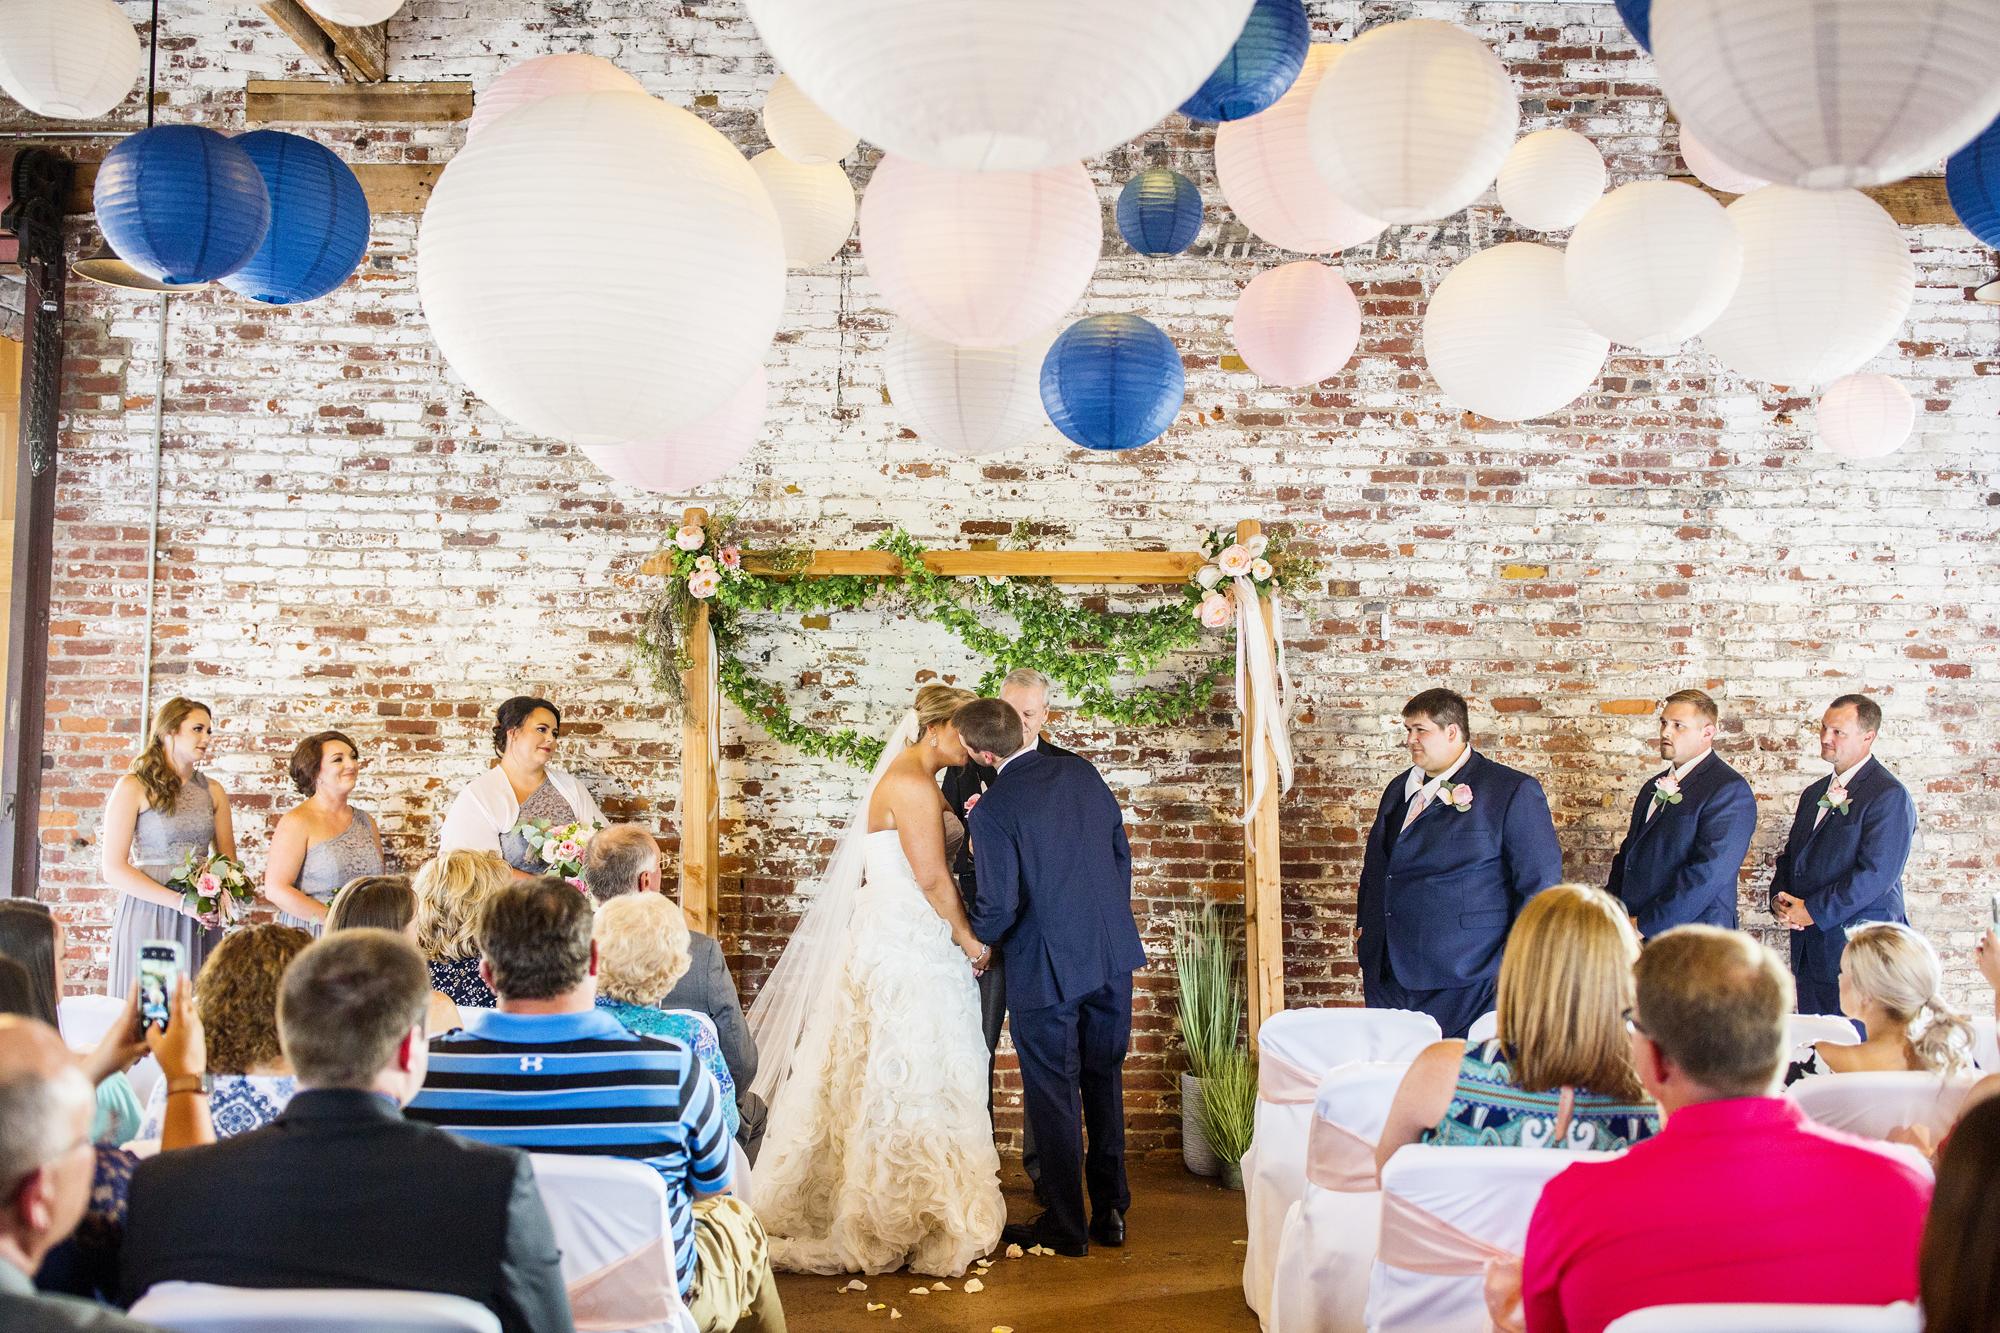 Seriously_Sabrina_Photography_Ashland_Kentucky_Train_Depot_Wedding_Parsons47.jpg